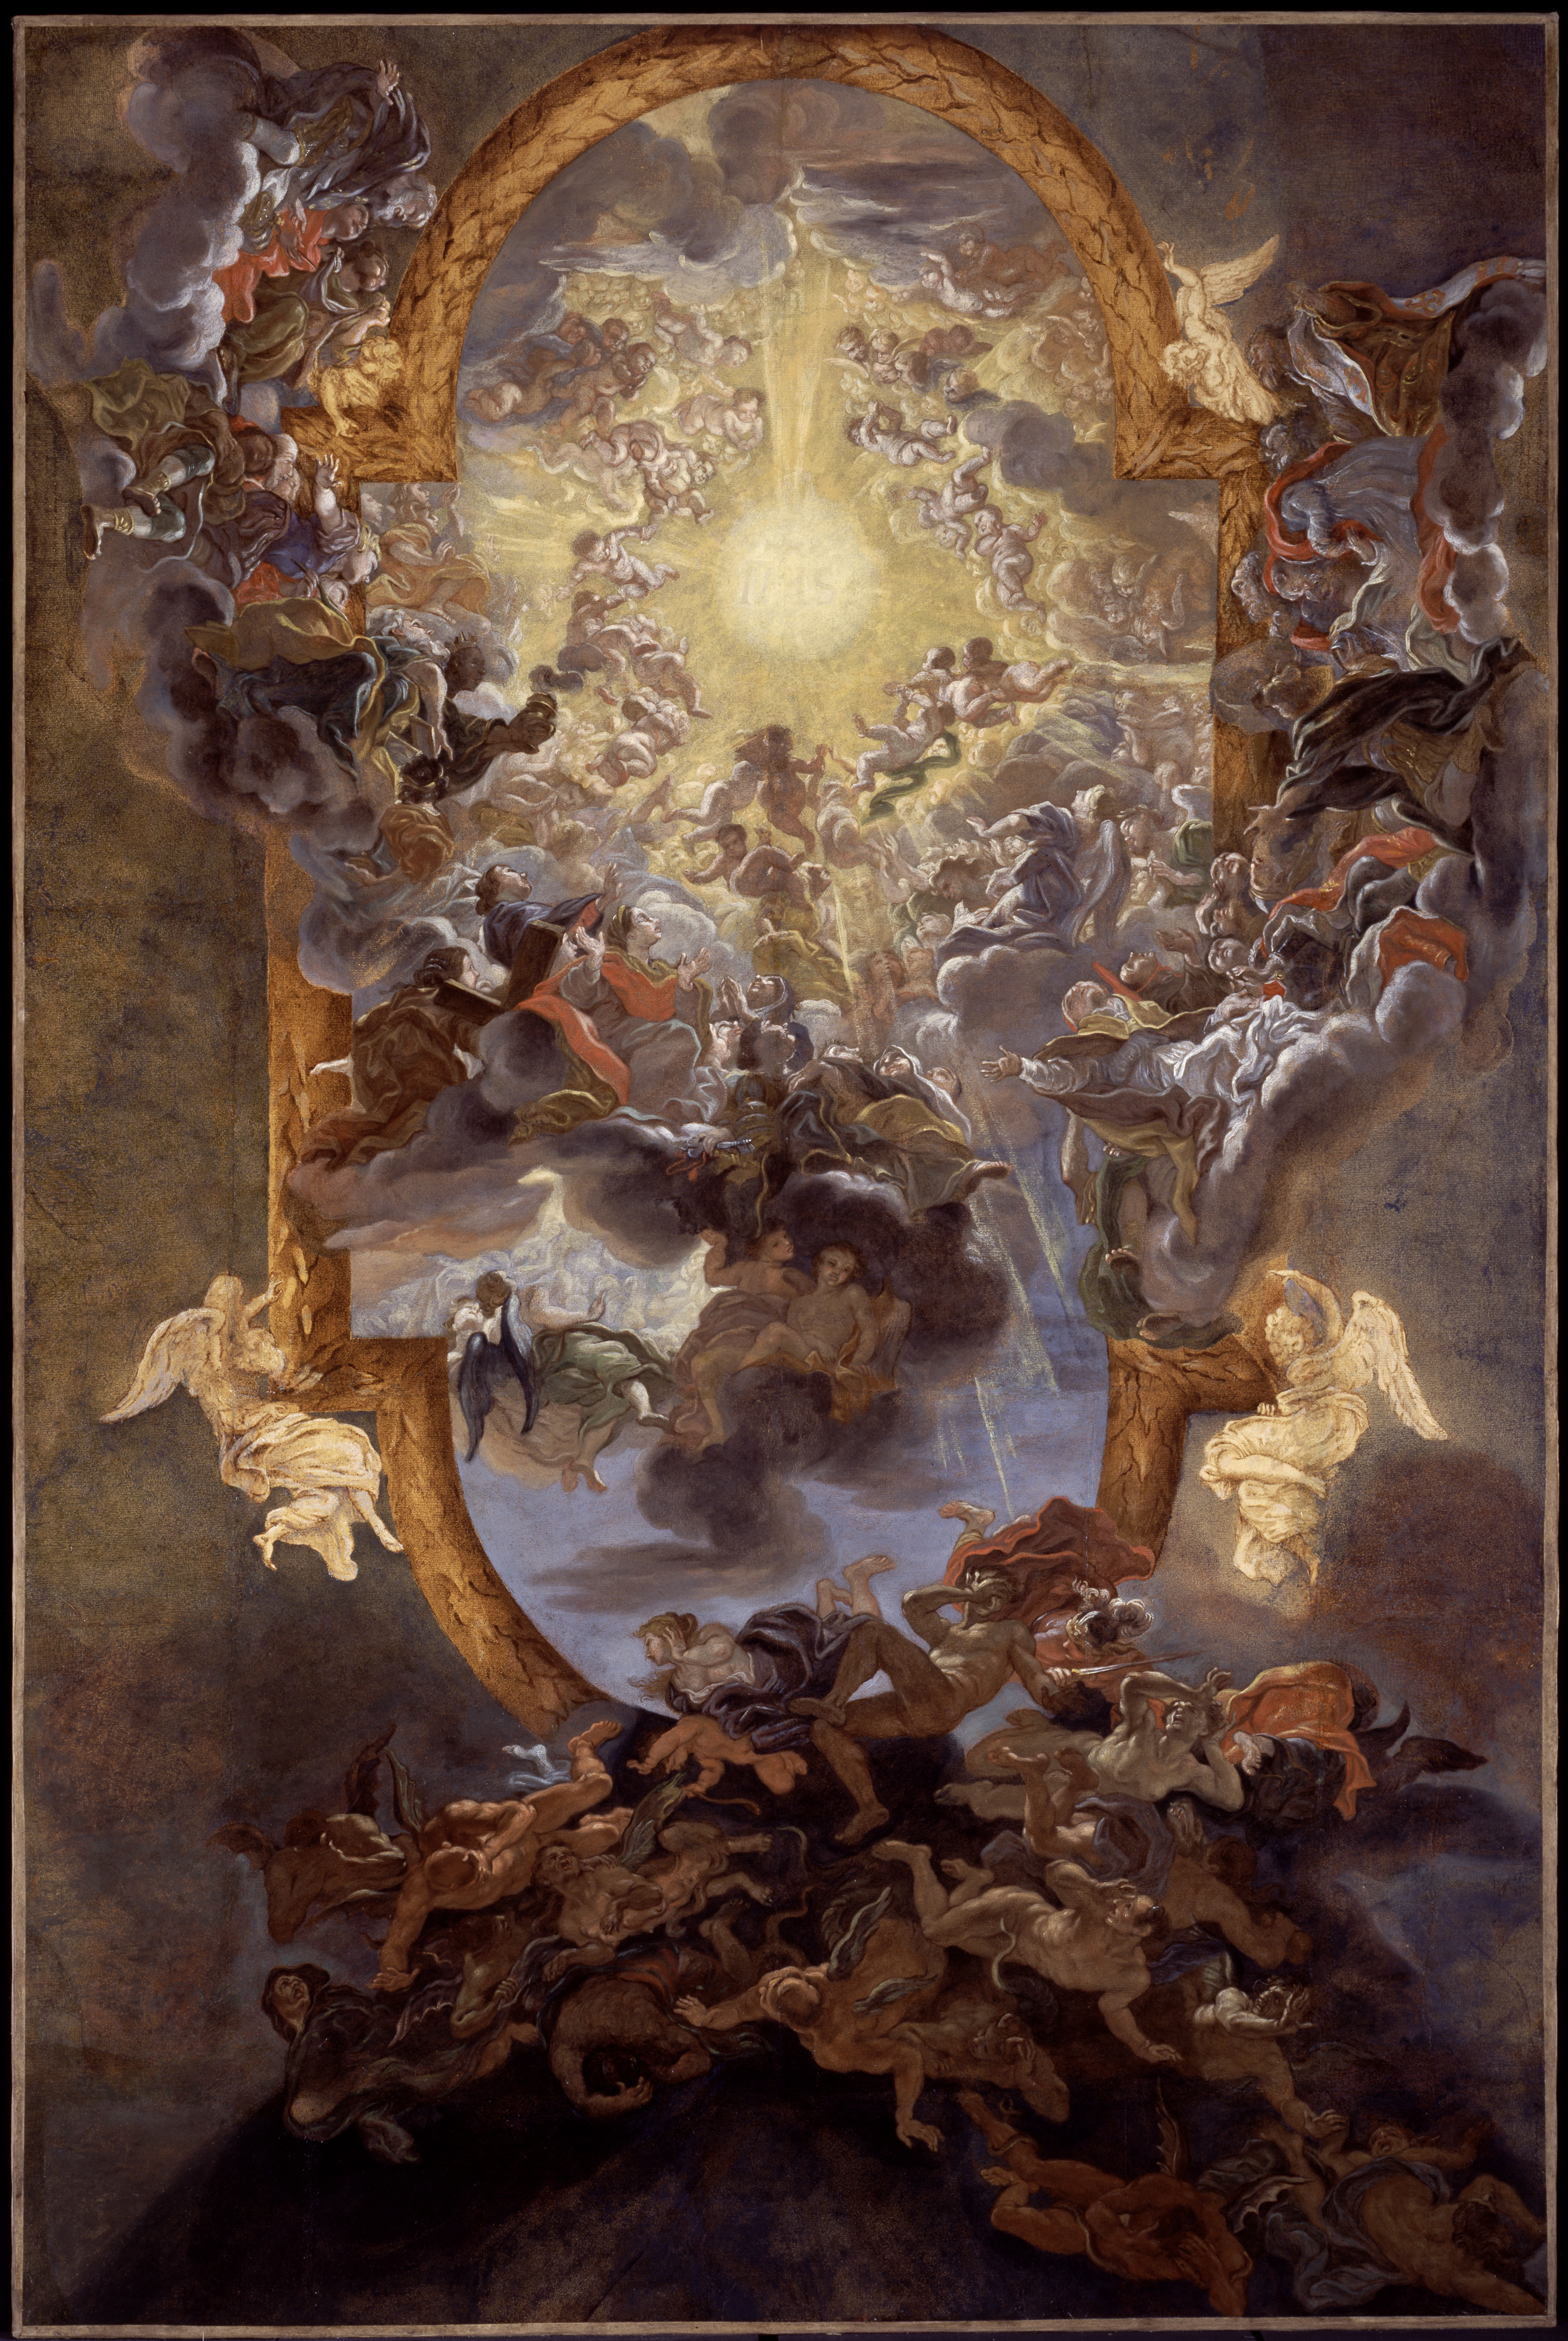 The Entire Sistine Chapel Ceiling Art